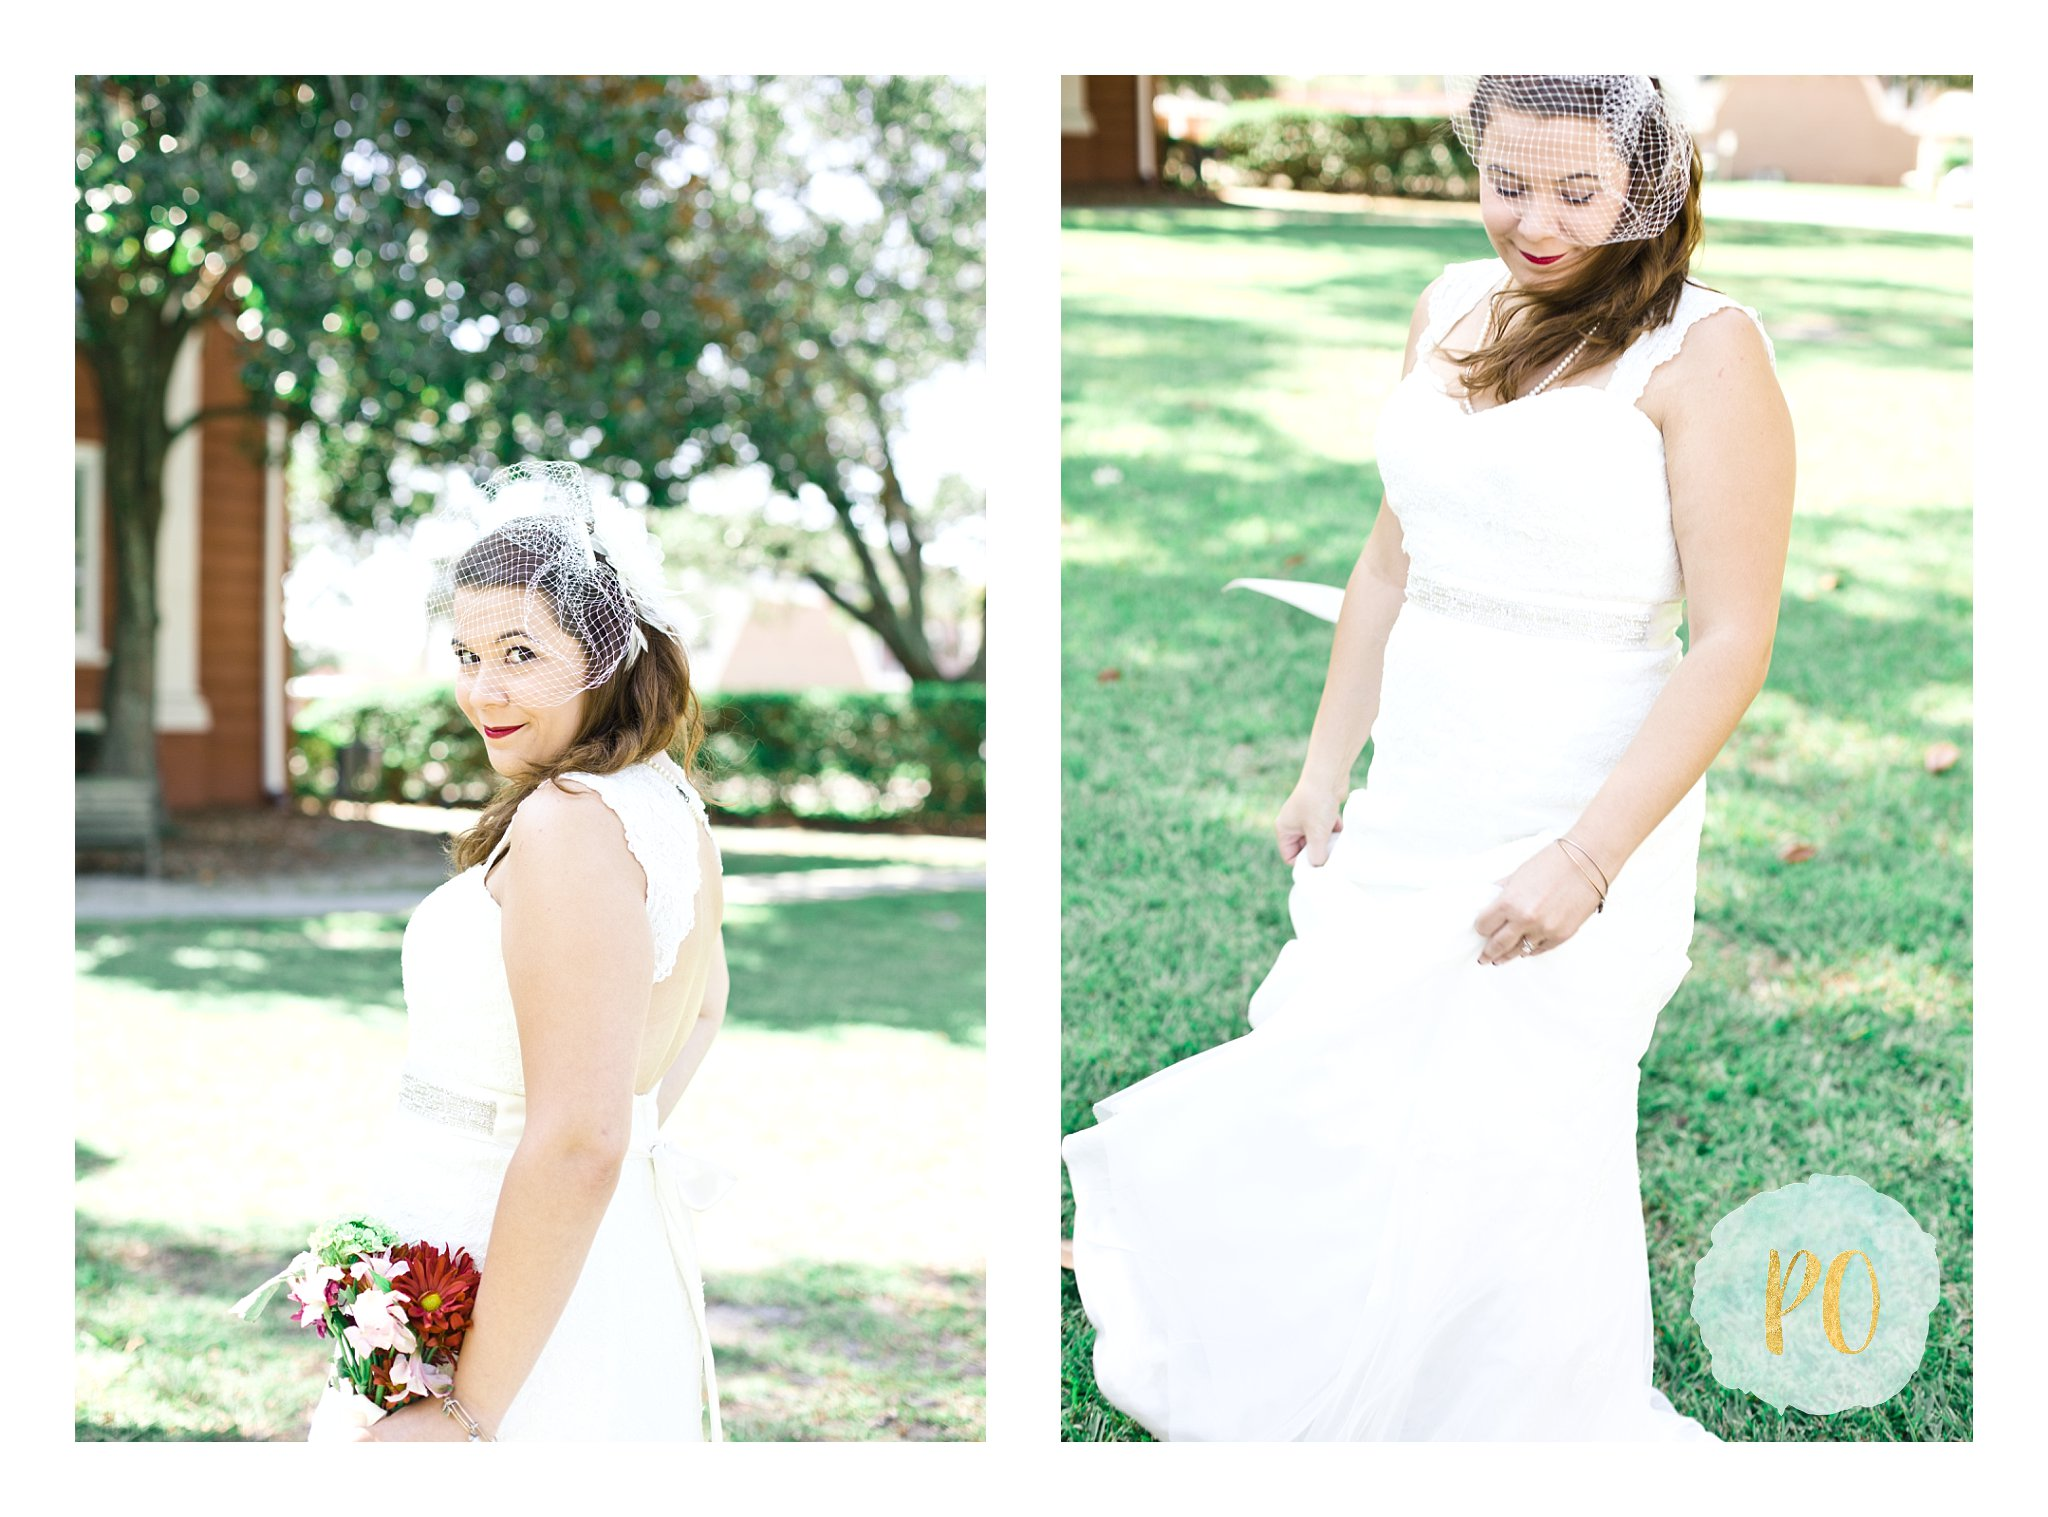 cypress-inn-lowcountry-bridal-session-conway-sc-photos_0143.jpg